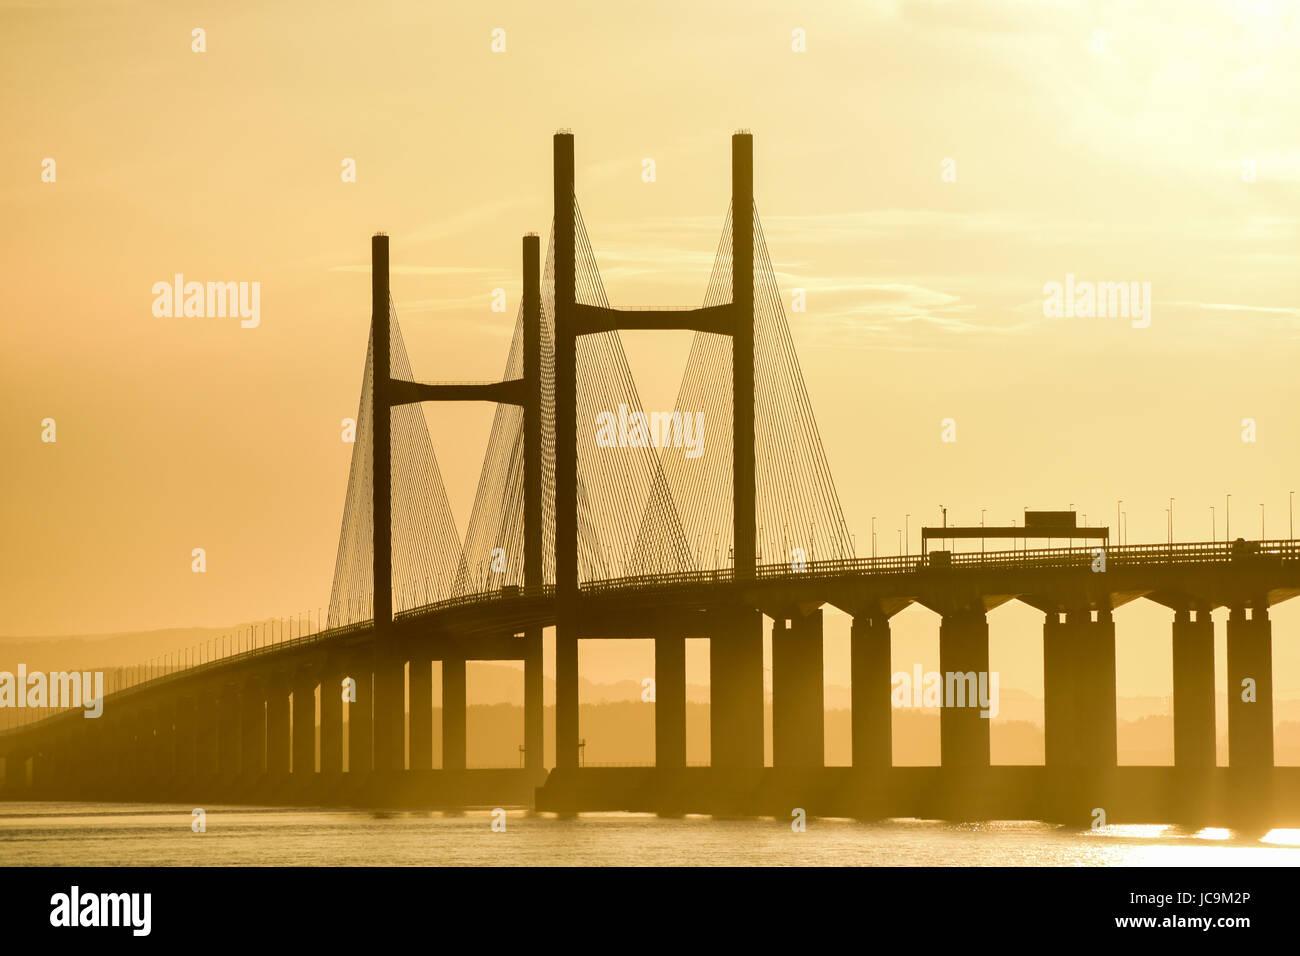 The Second Severn Bridge Crossing / M4 Motorway - in soft early evening sunlight, Nr Bristol, UK. - Stock Image